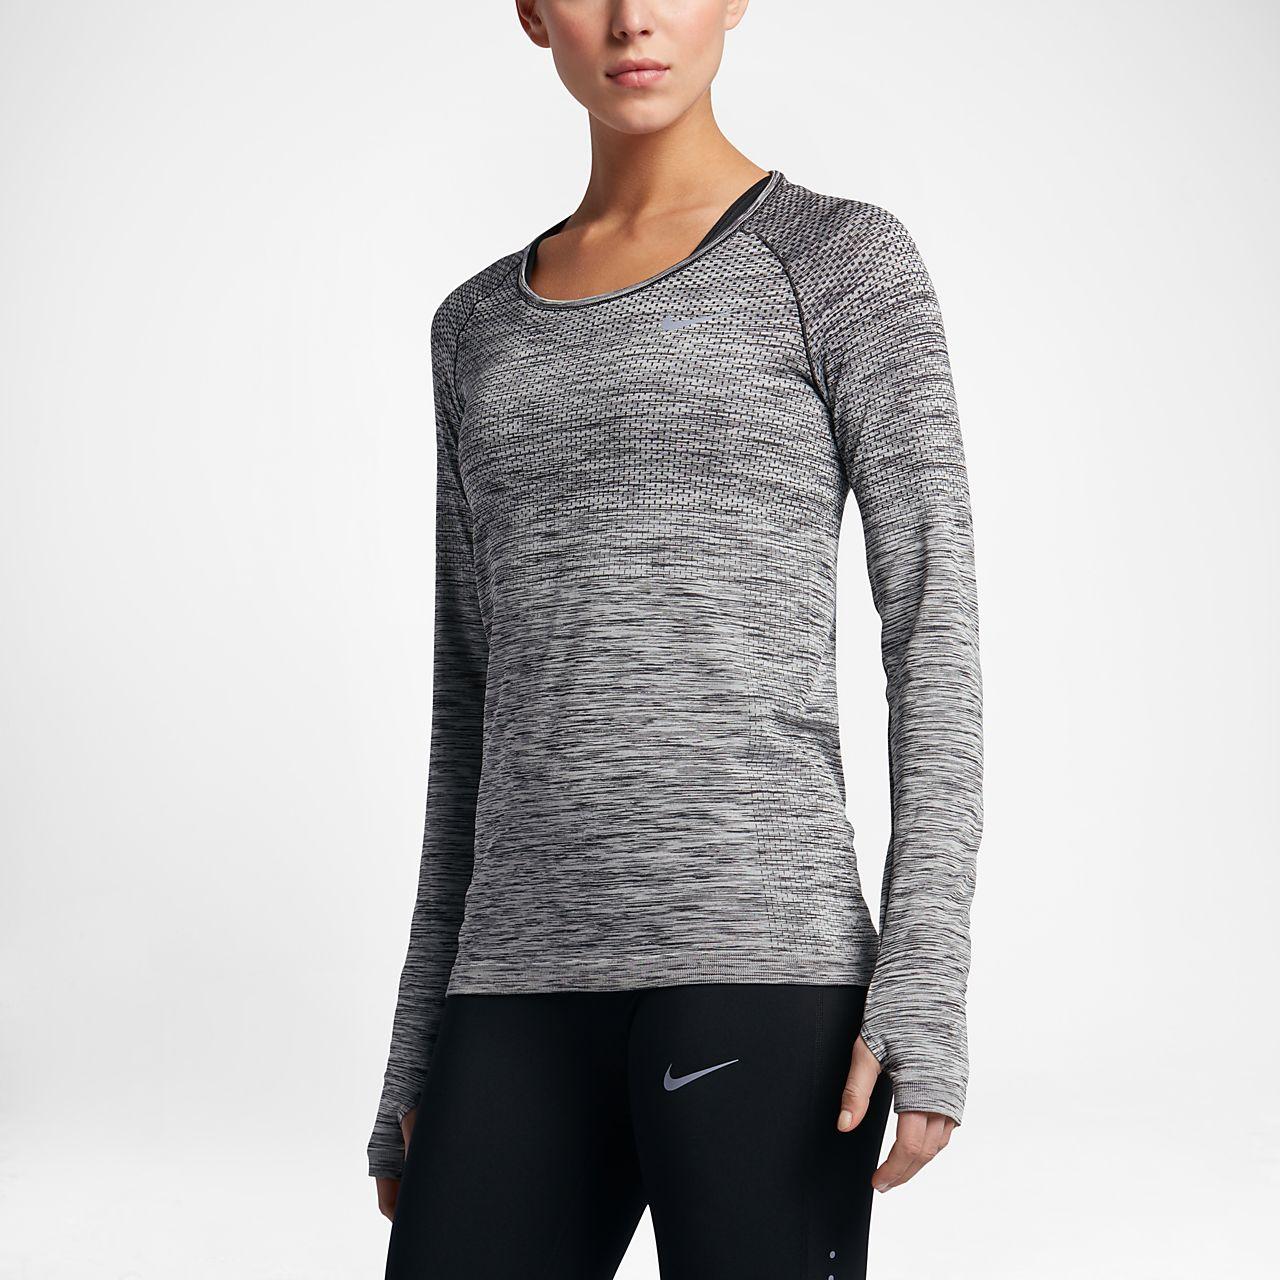 ... Nike Dri-FIT Knit Women's Long Sleeve Running Top